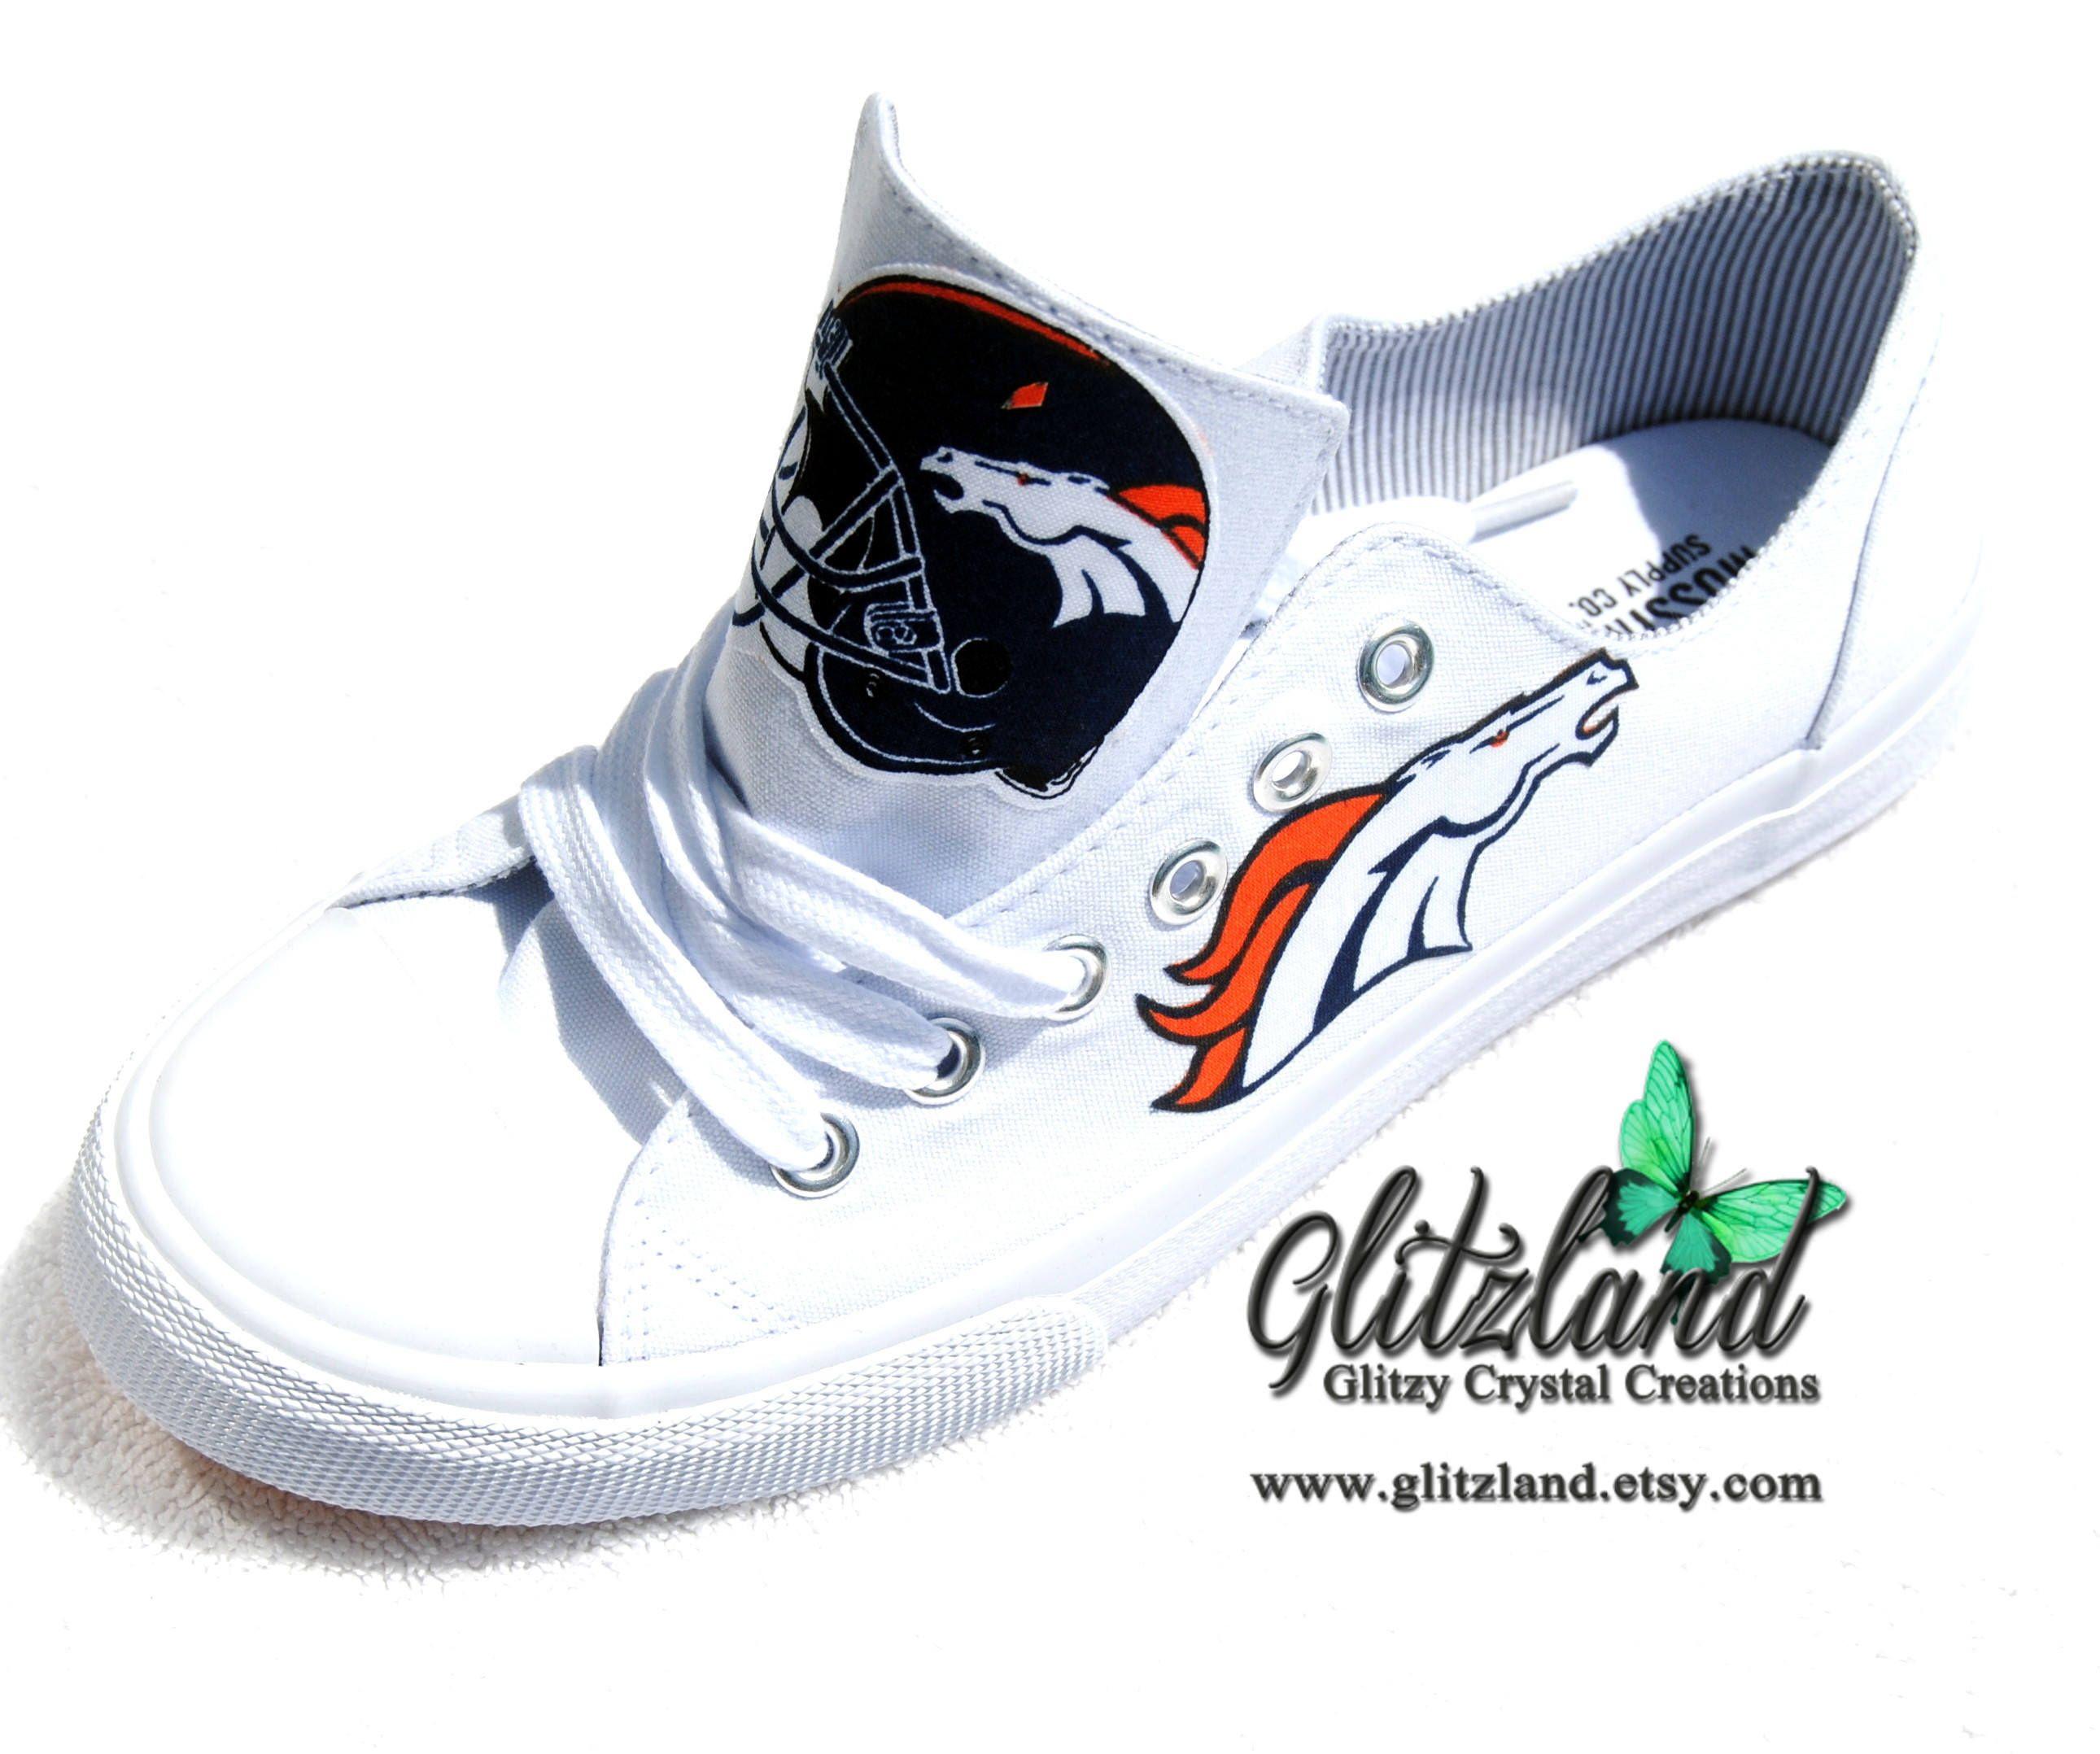 585d55f1d73198 Denver Broncos White Low Top Fashion Tennis Shoes by Glitzland on Etsy  https